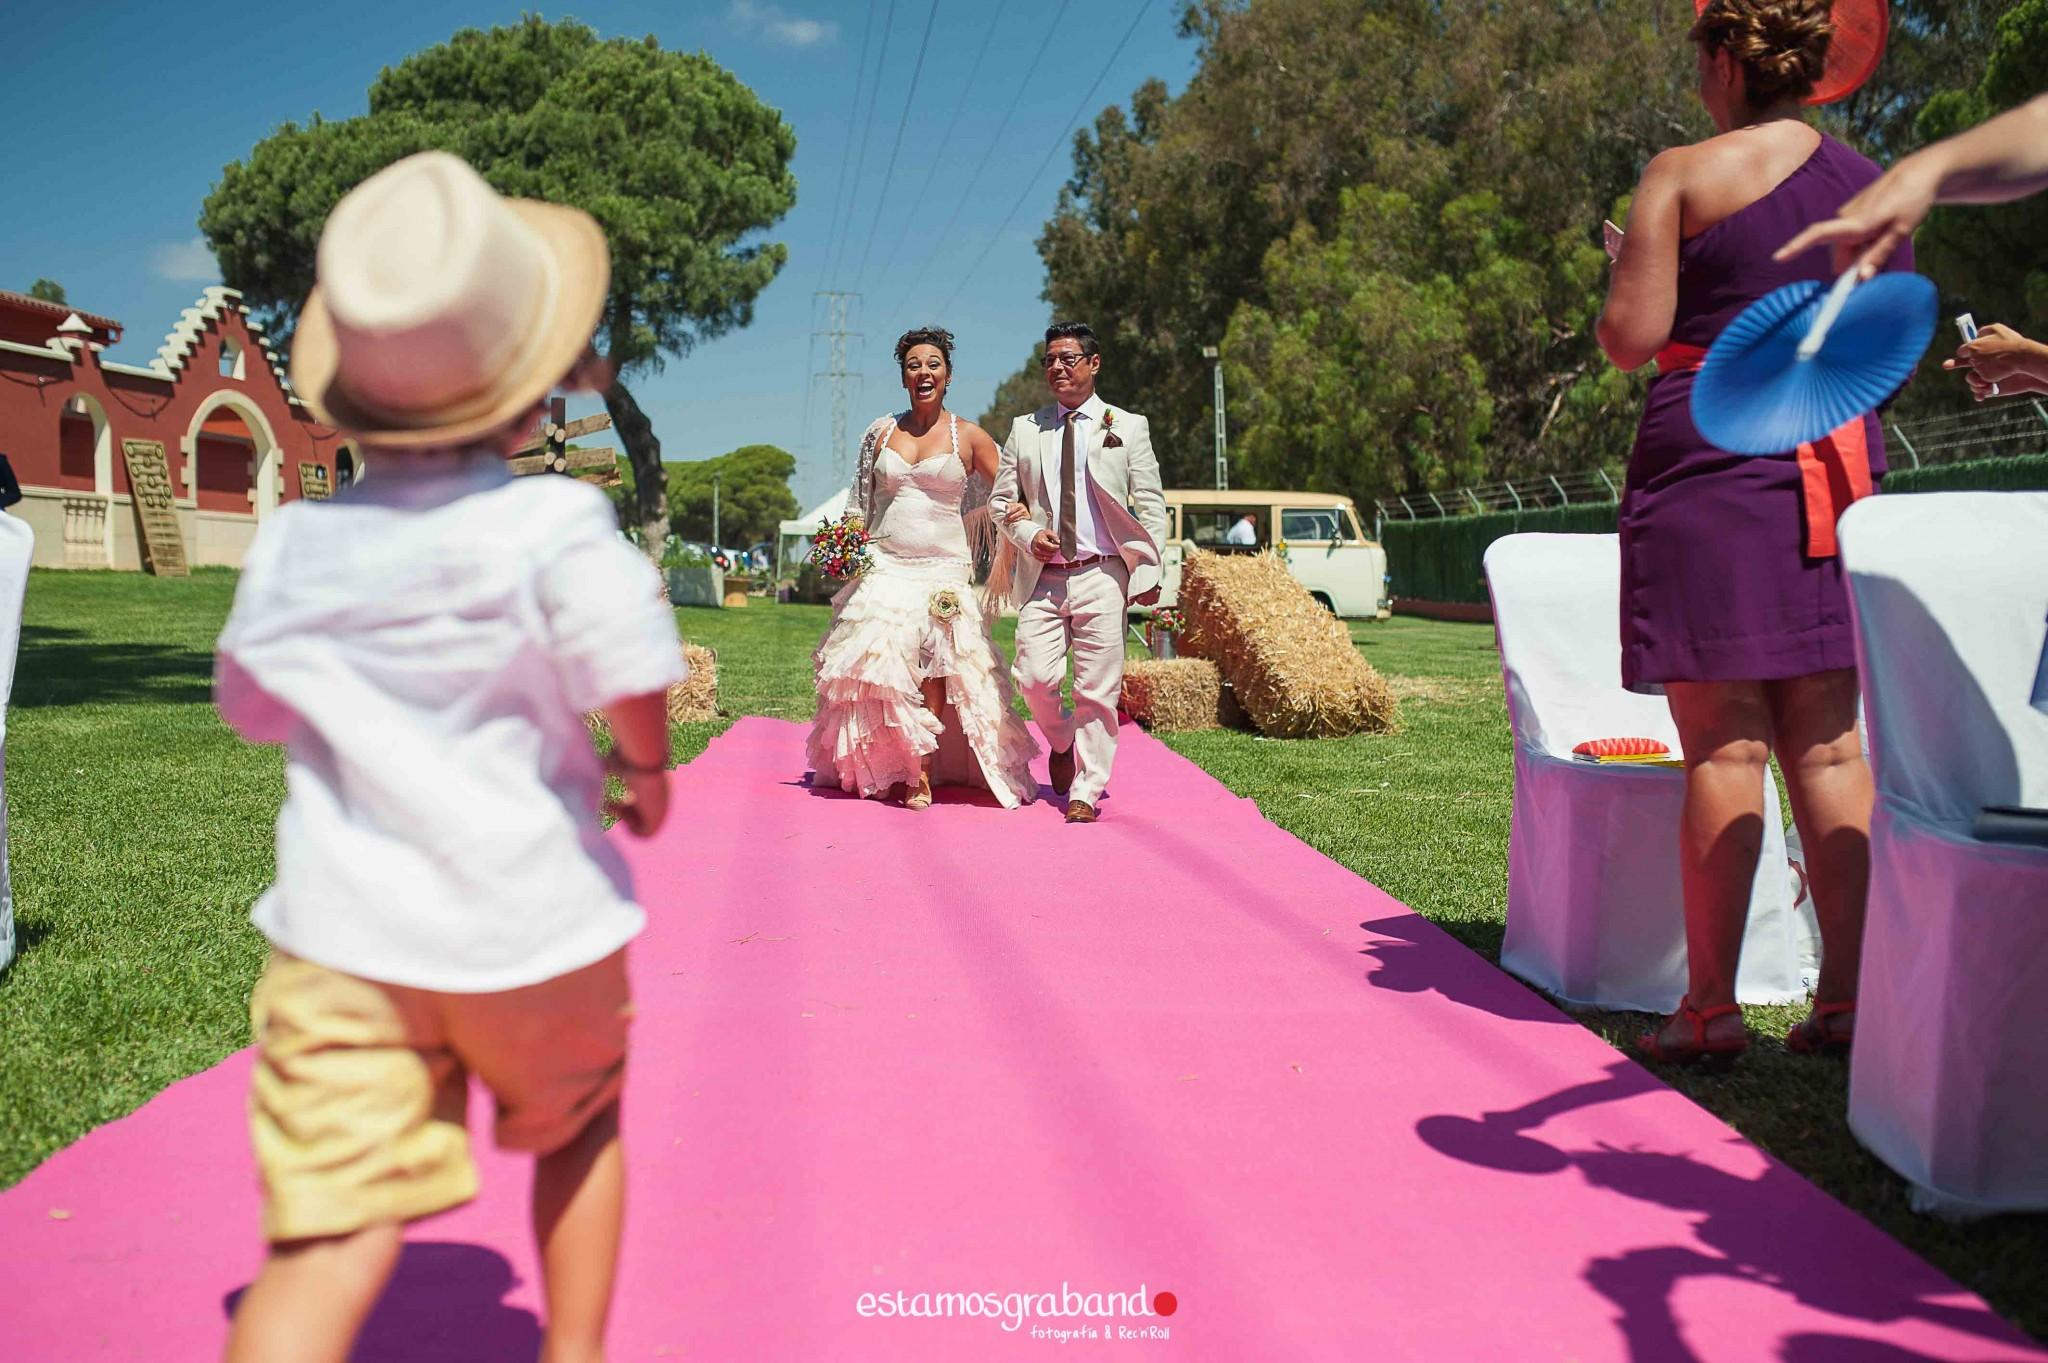 pili-y-jose_fotograficc81a-cadiz-38 Pili & Jose - video boda cadiz